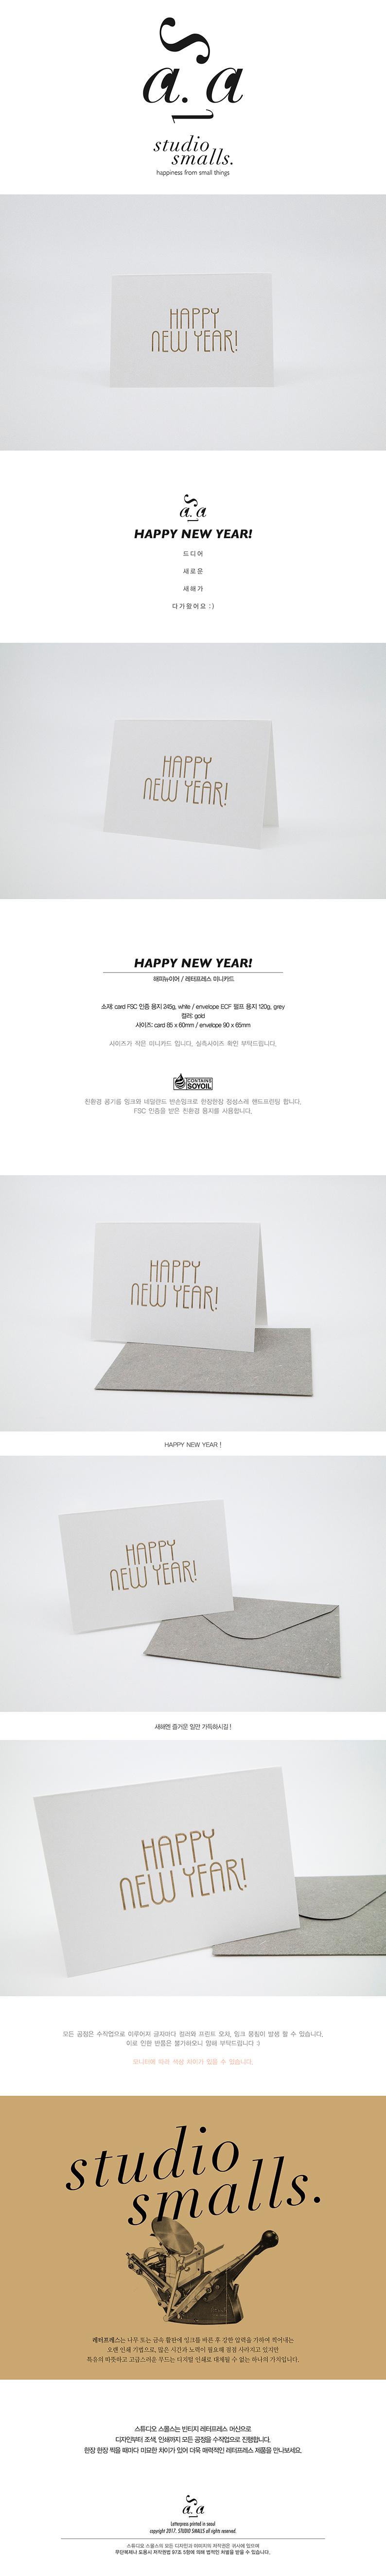 HAPPY NEW YEAR 해피뉴이어 레터프레스 신년 미니카드 - 스튜디오스몰스, 3,000원, 카드, 시즌/테마 카드